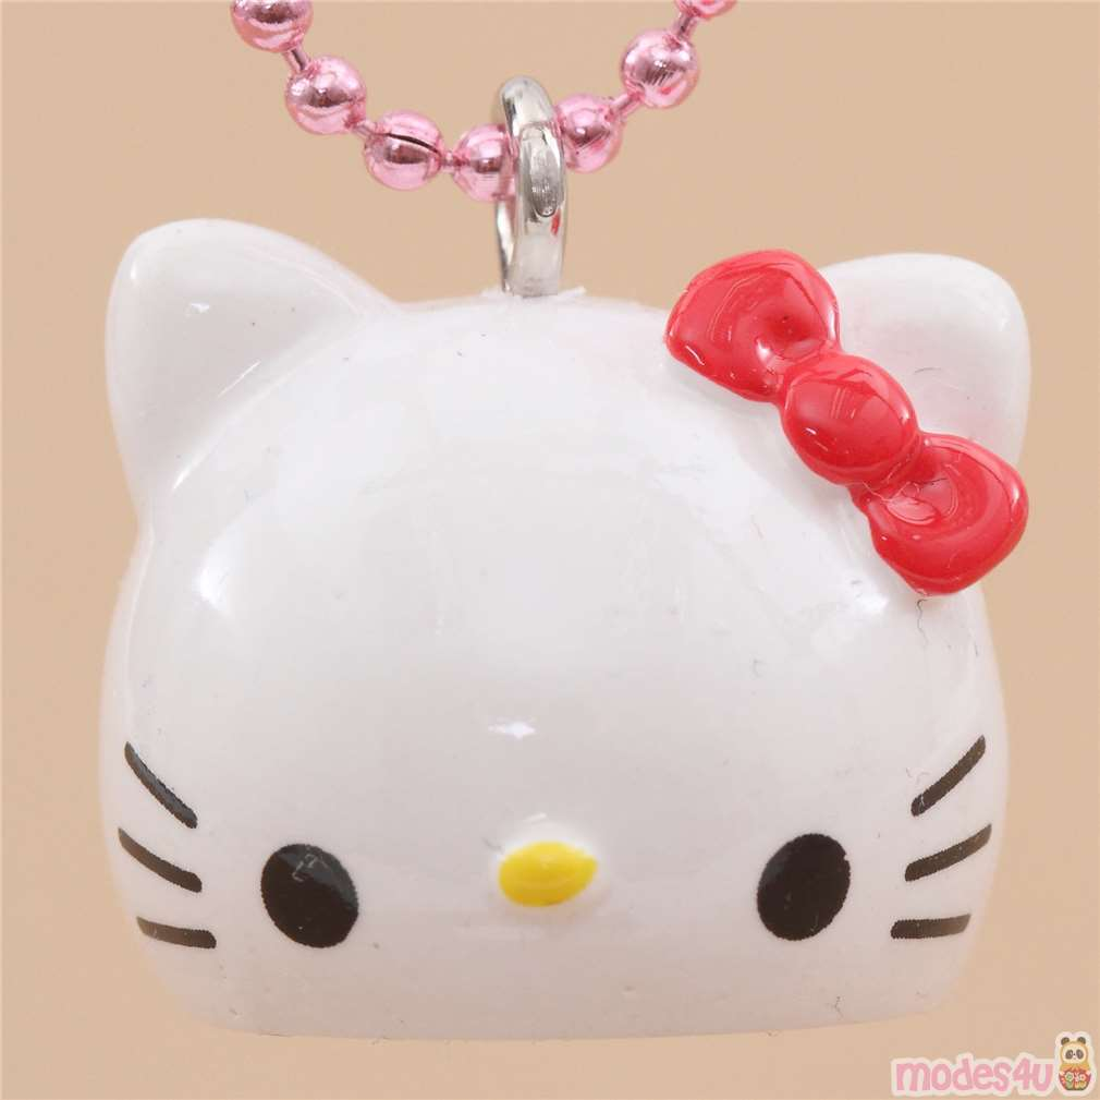 "Sanrio Teddy Red Hello Kitty Charm Necklace 15/"" Chain Q"